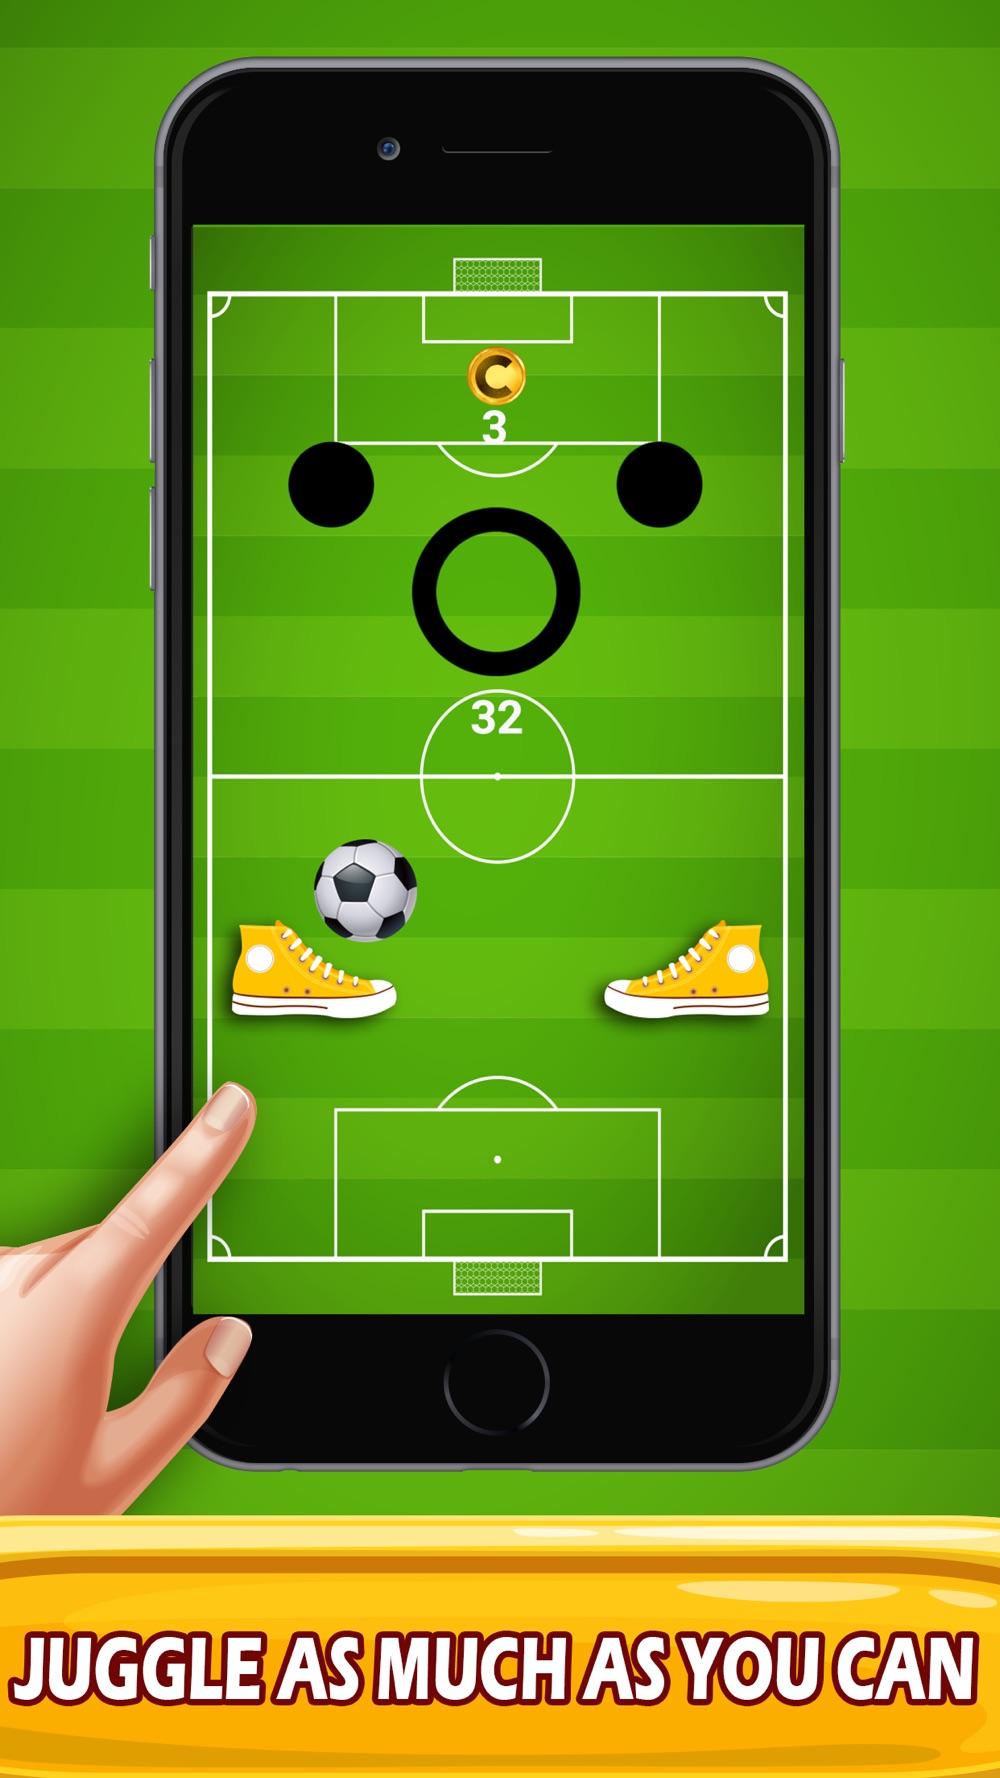 Juggler Fury - Afterpulse Soccer Mania hack tool